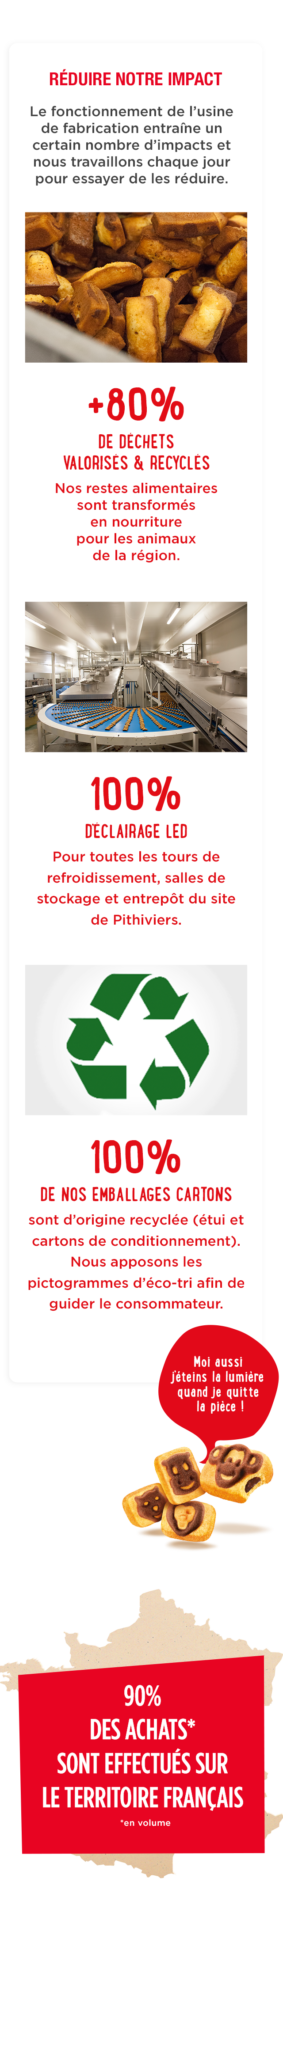 actions-environnementales-640x4636